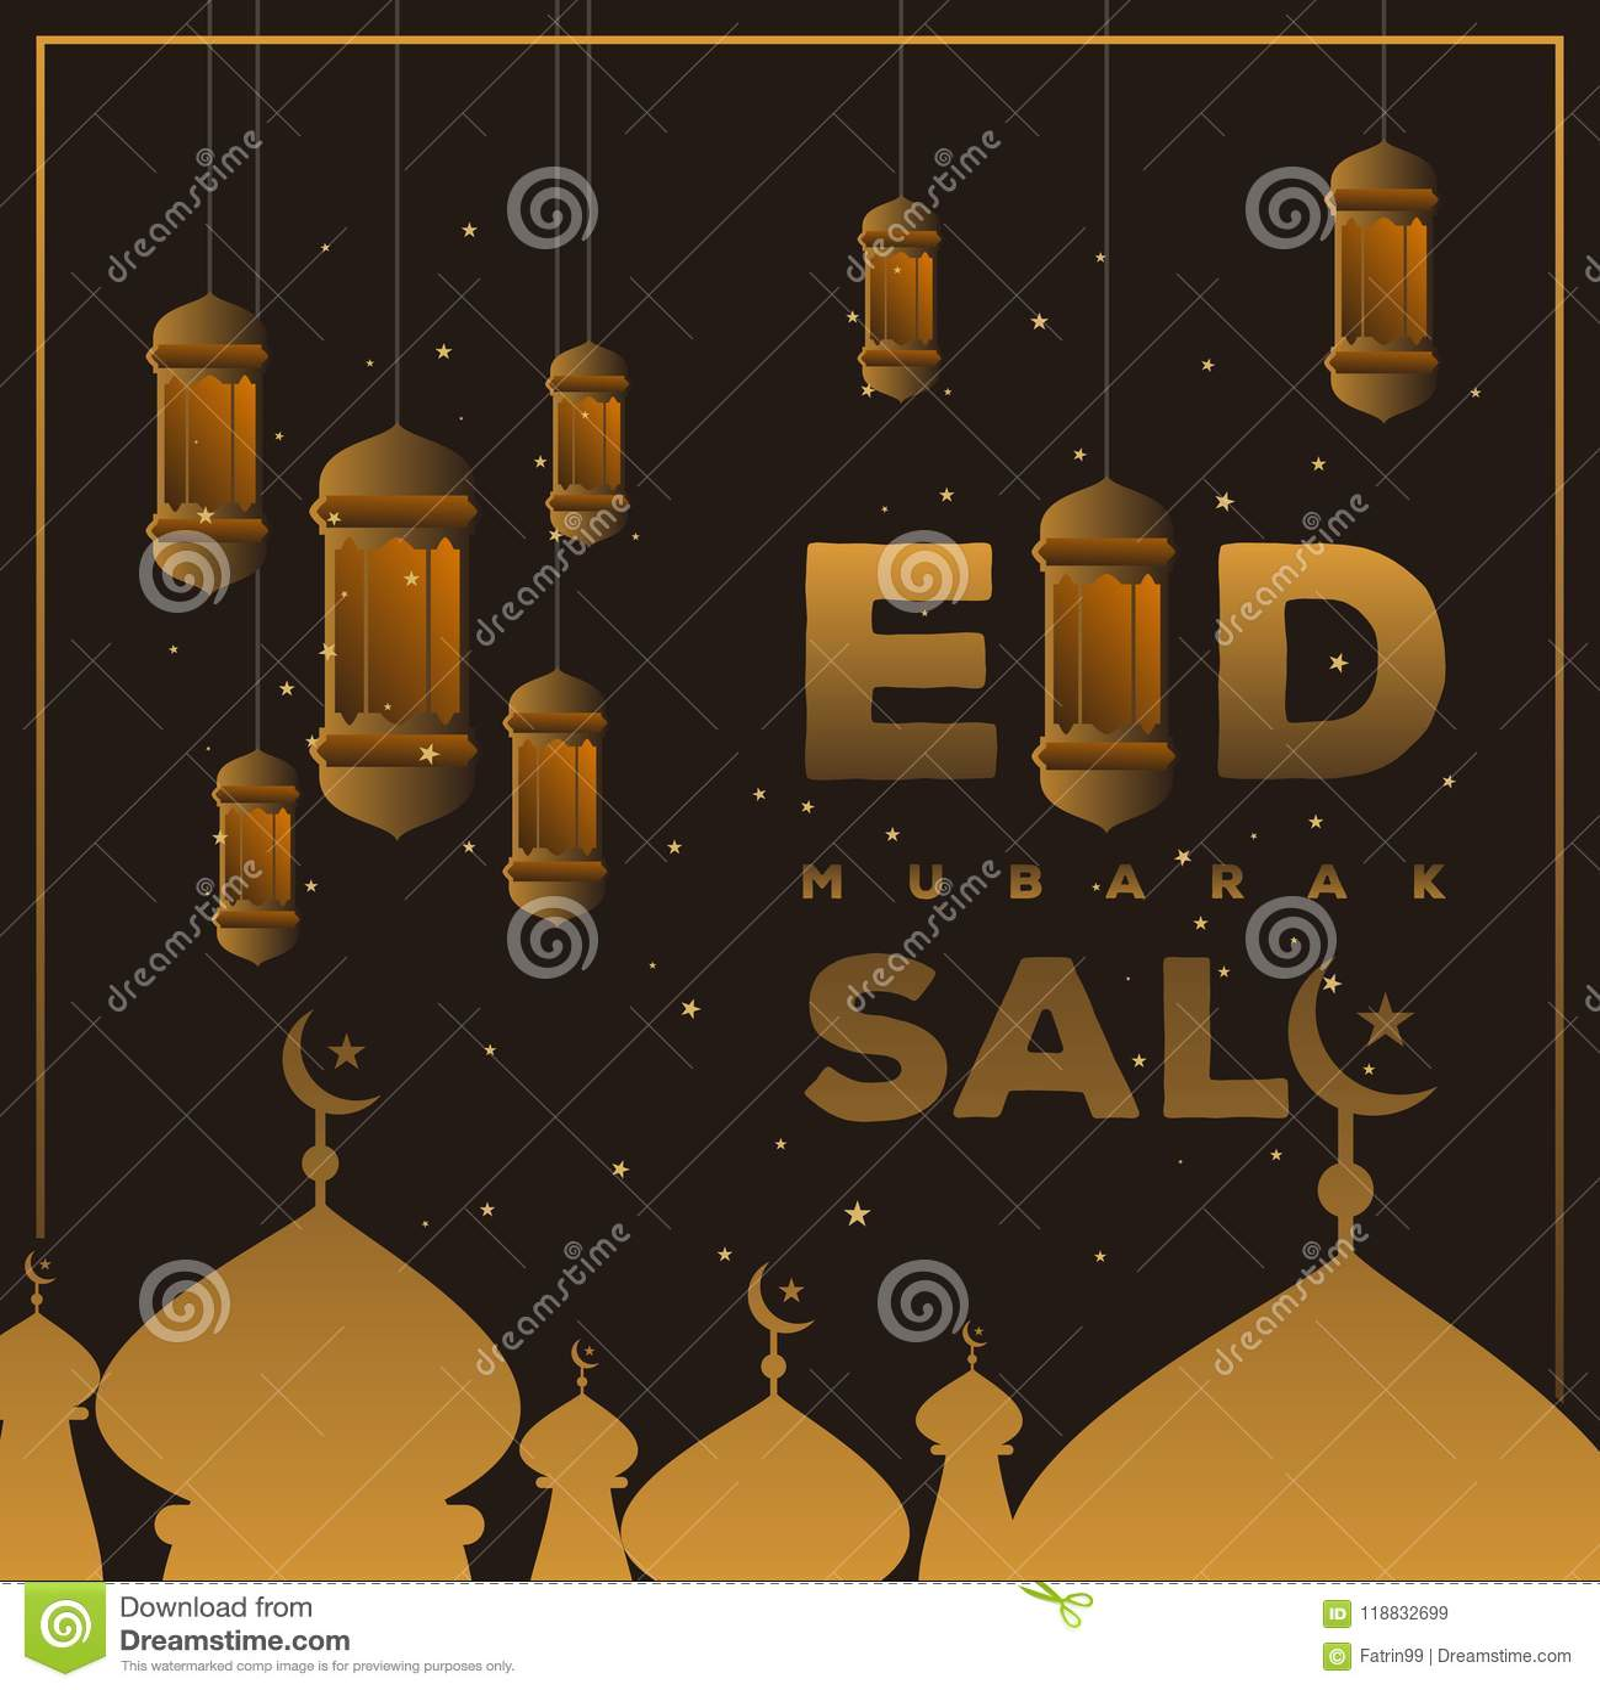 Eid Mubarak Sale Design For Your Business Stock Vector